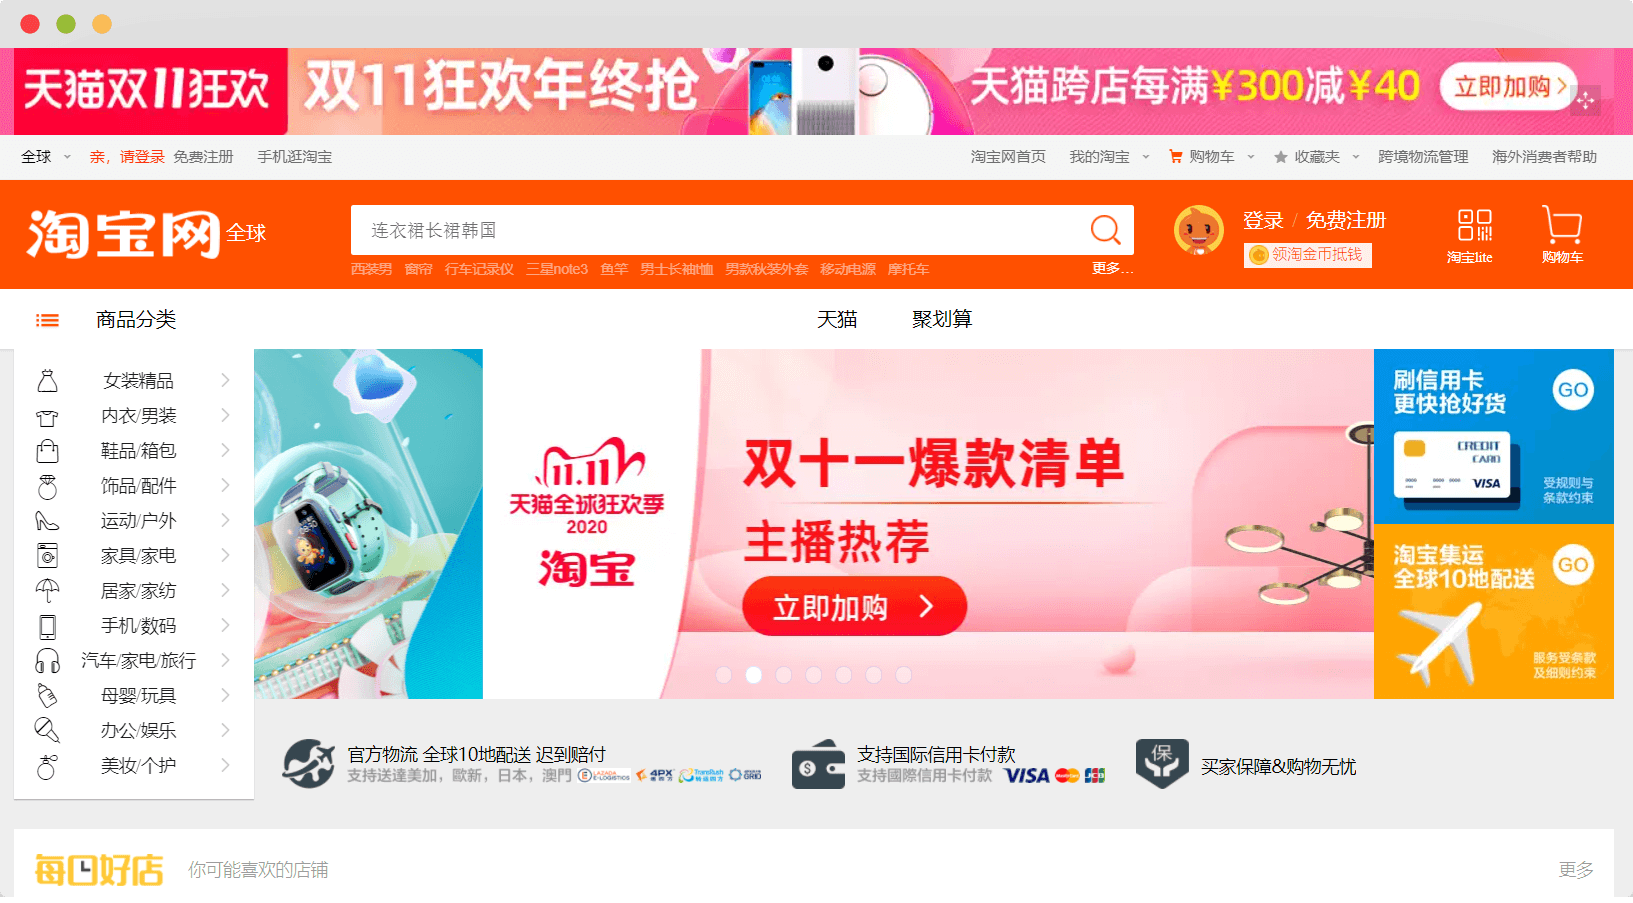 Figure 9 Taobao